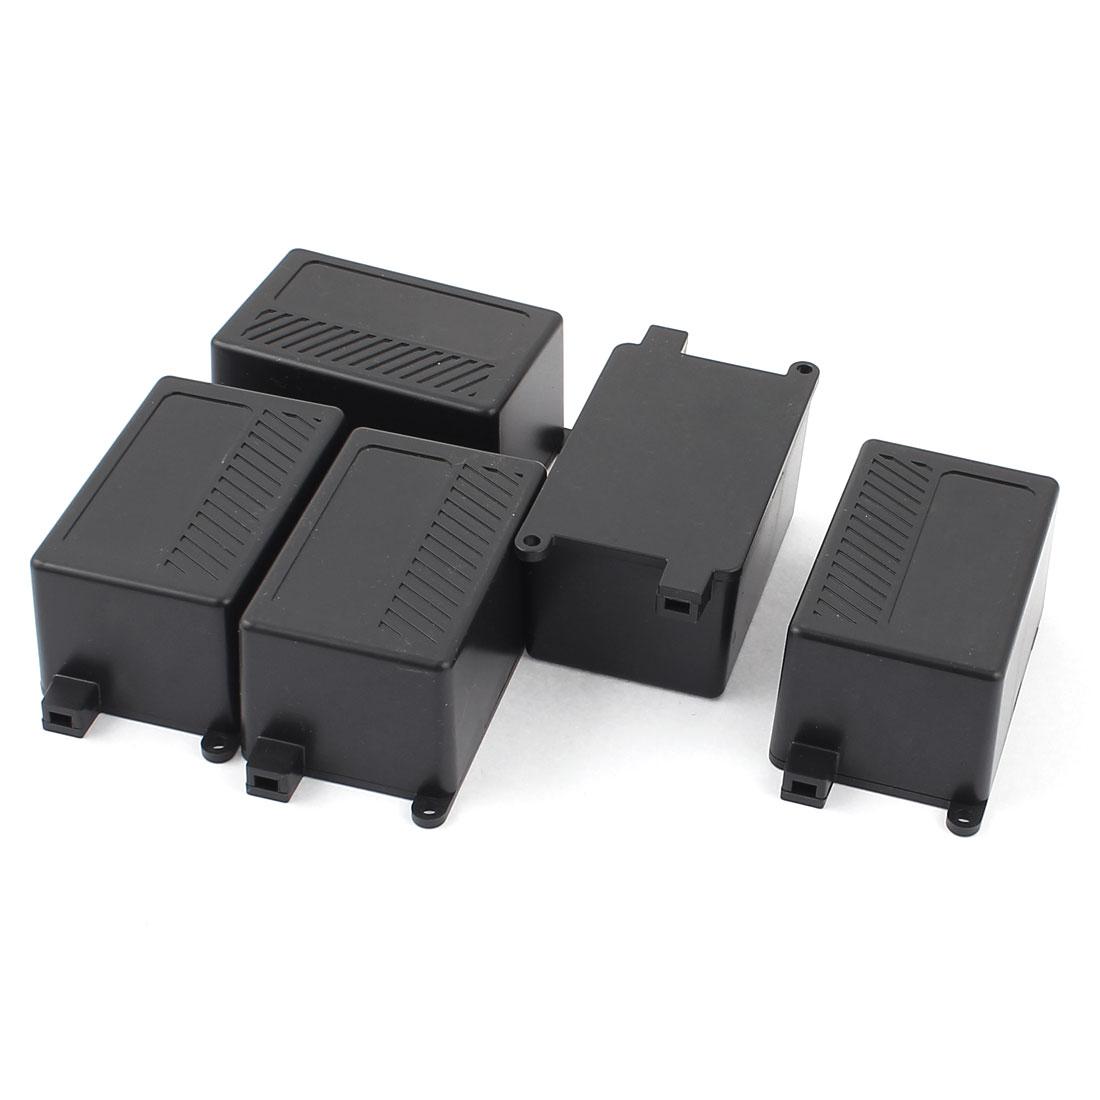 Rectangular Plastic Electric Cable Junction Box 68x43x35mm Black 5pcs